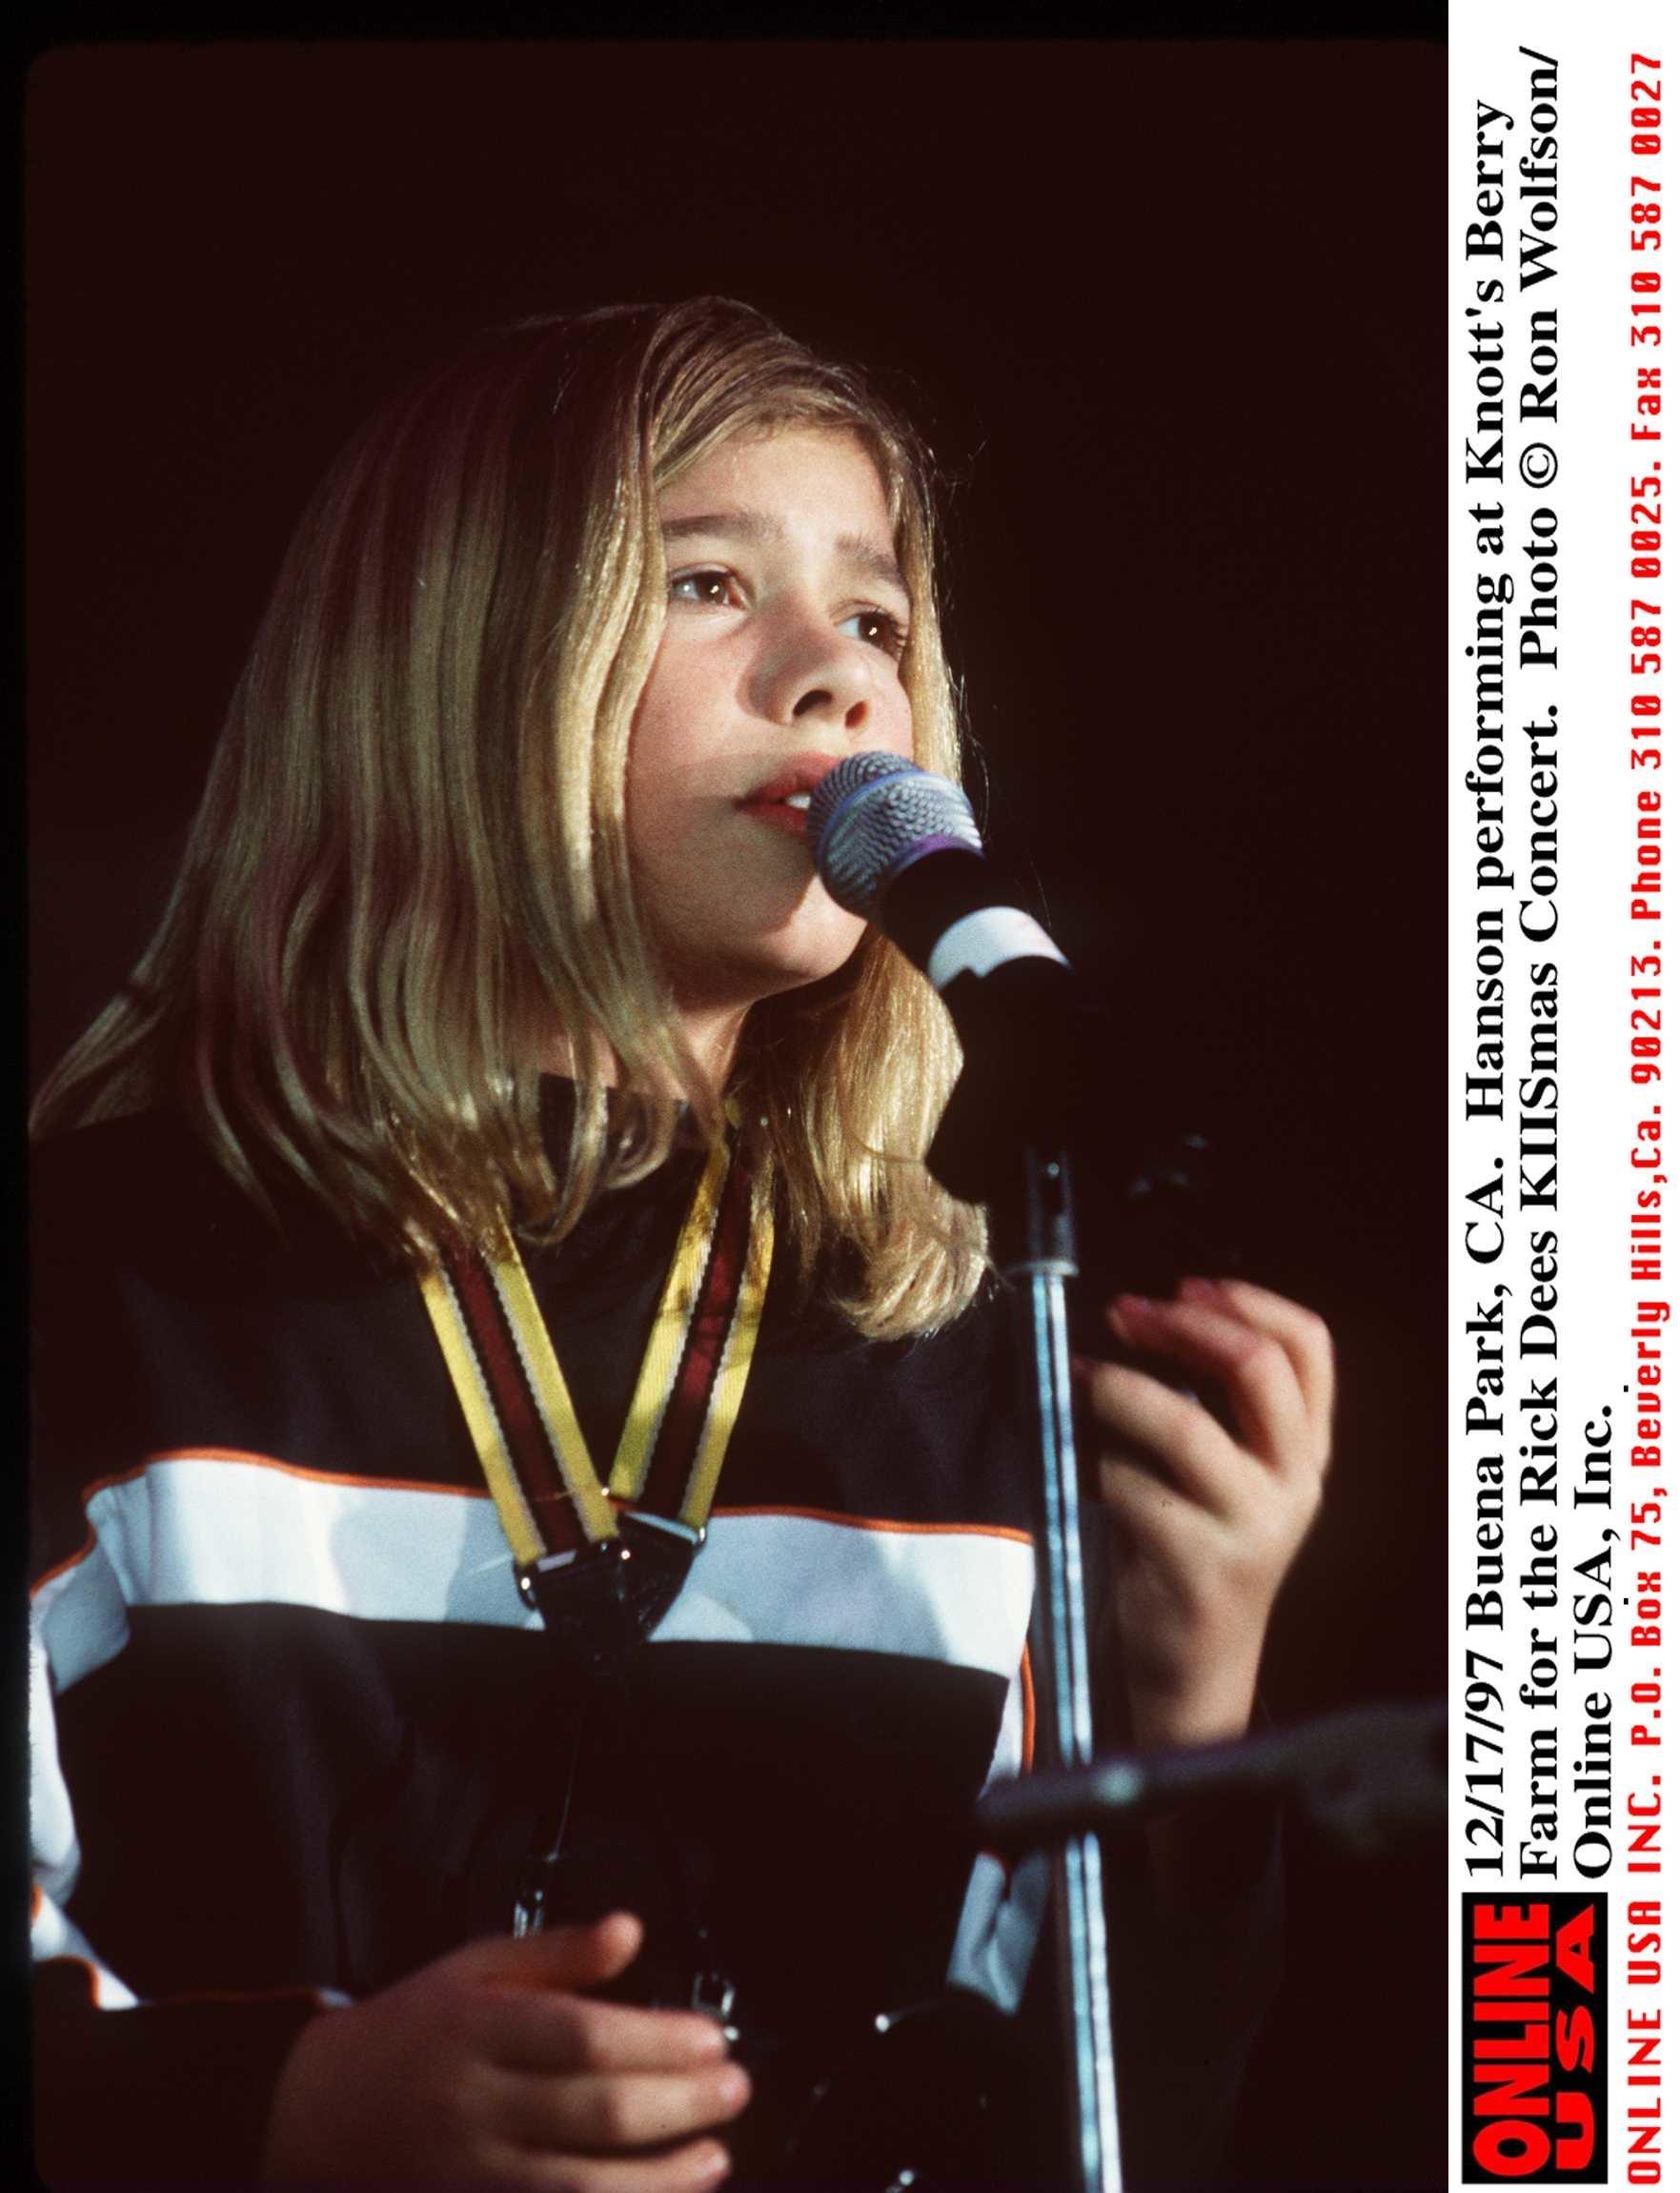 12/17/97 Buena Park, CA. Hanson performing at Knotts Berry Farm for the Rick Dees KIISmas Concert. Zachary Hanson.